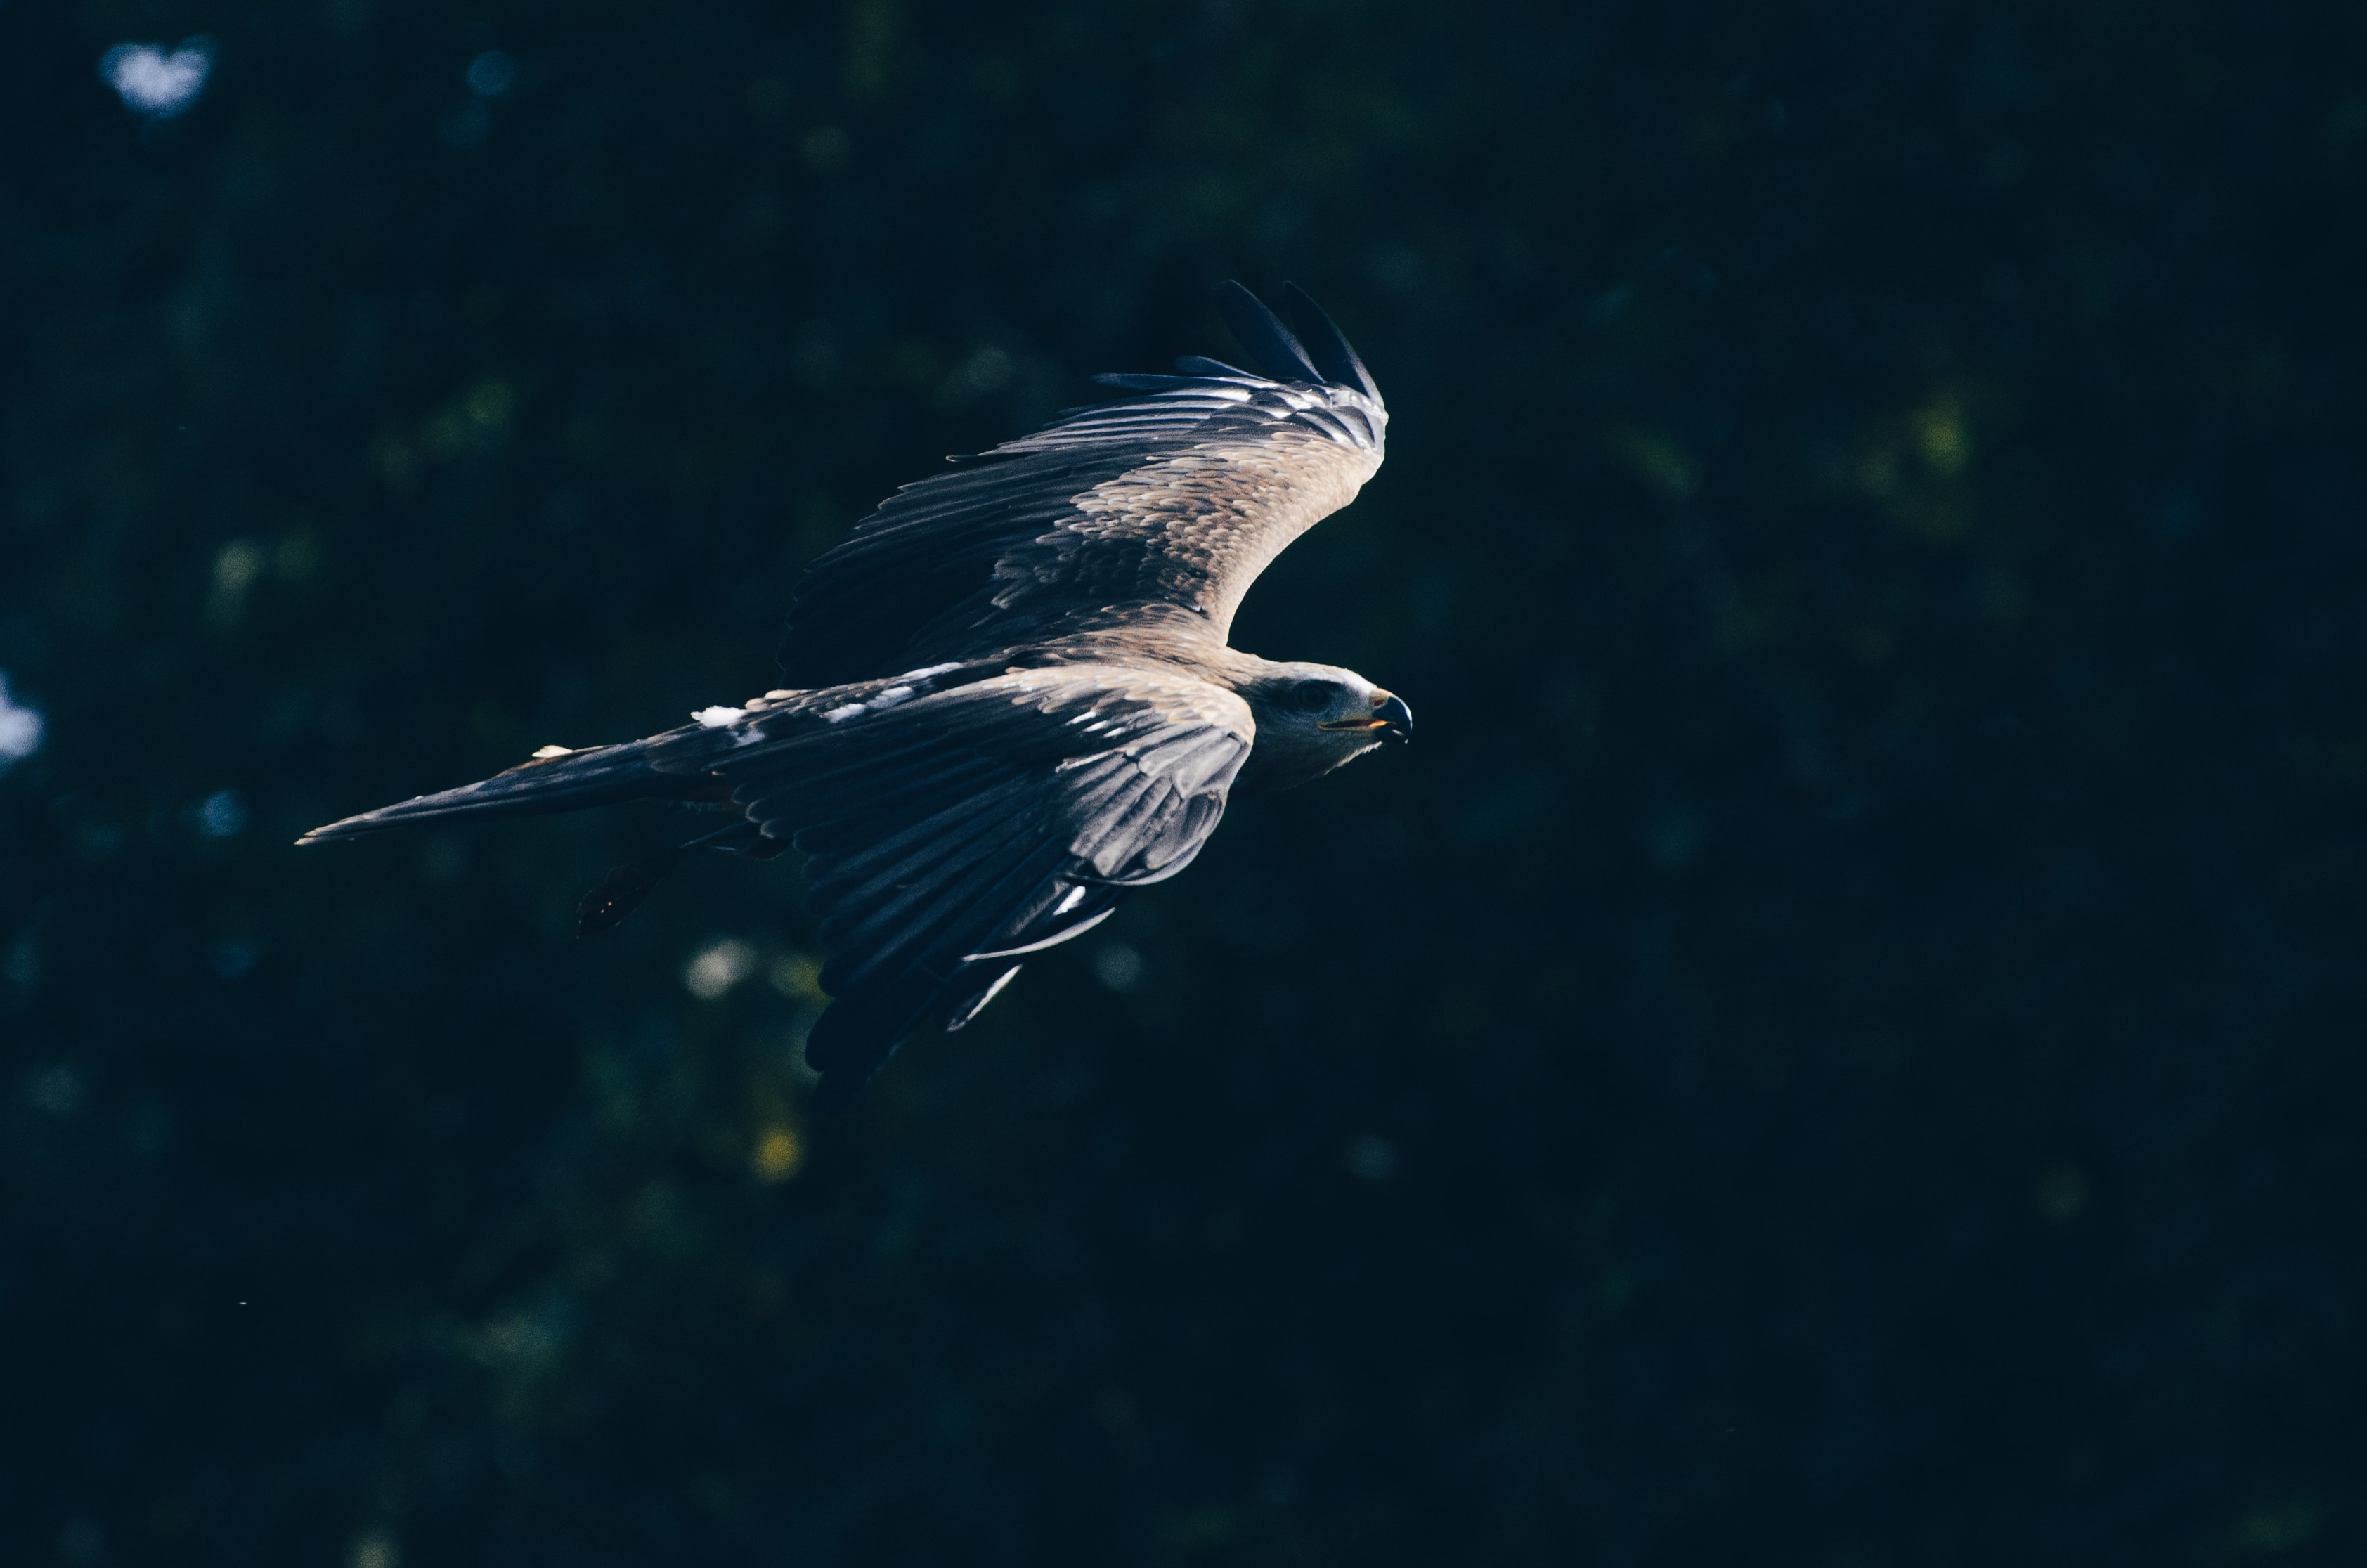 macro photography of grey and black eagle